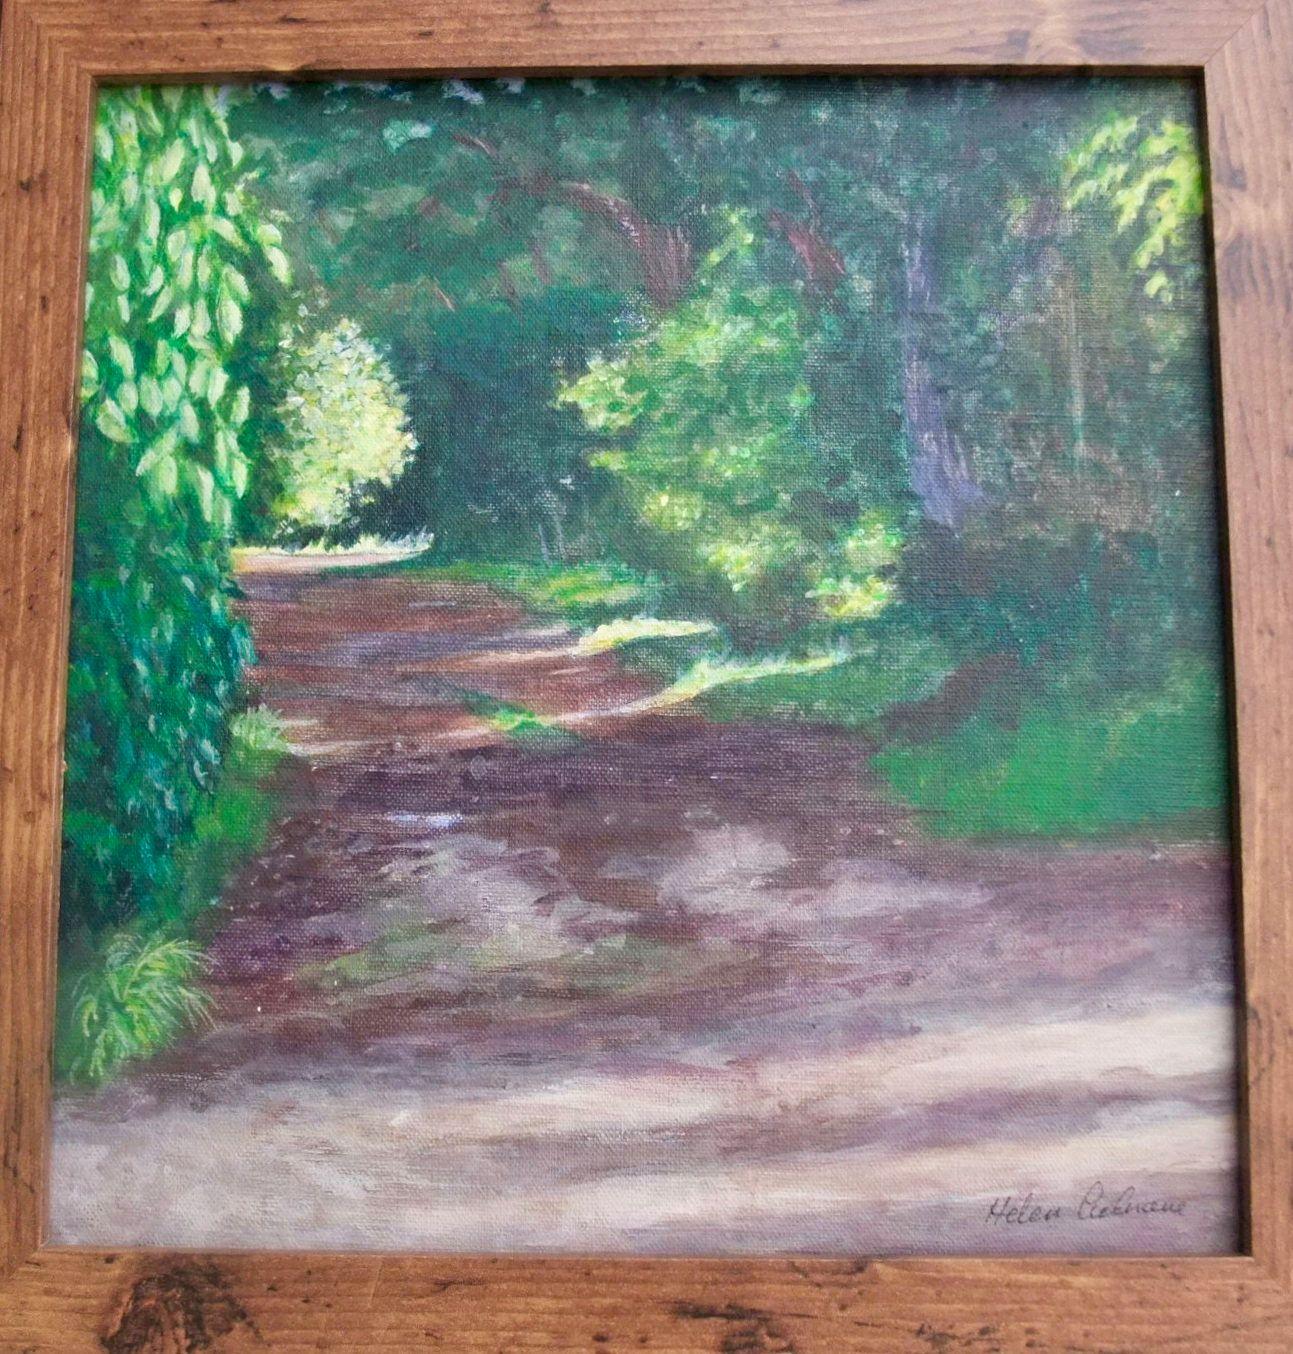 Mustill's Lane  ________________________________ acrylic on canvas board,  glazed wooden frame  (34cm x 34cm)           £35